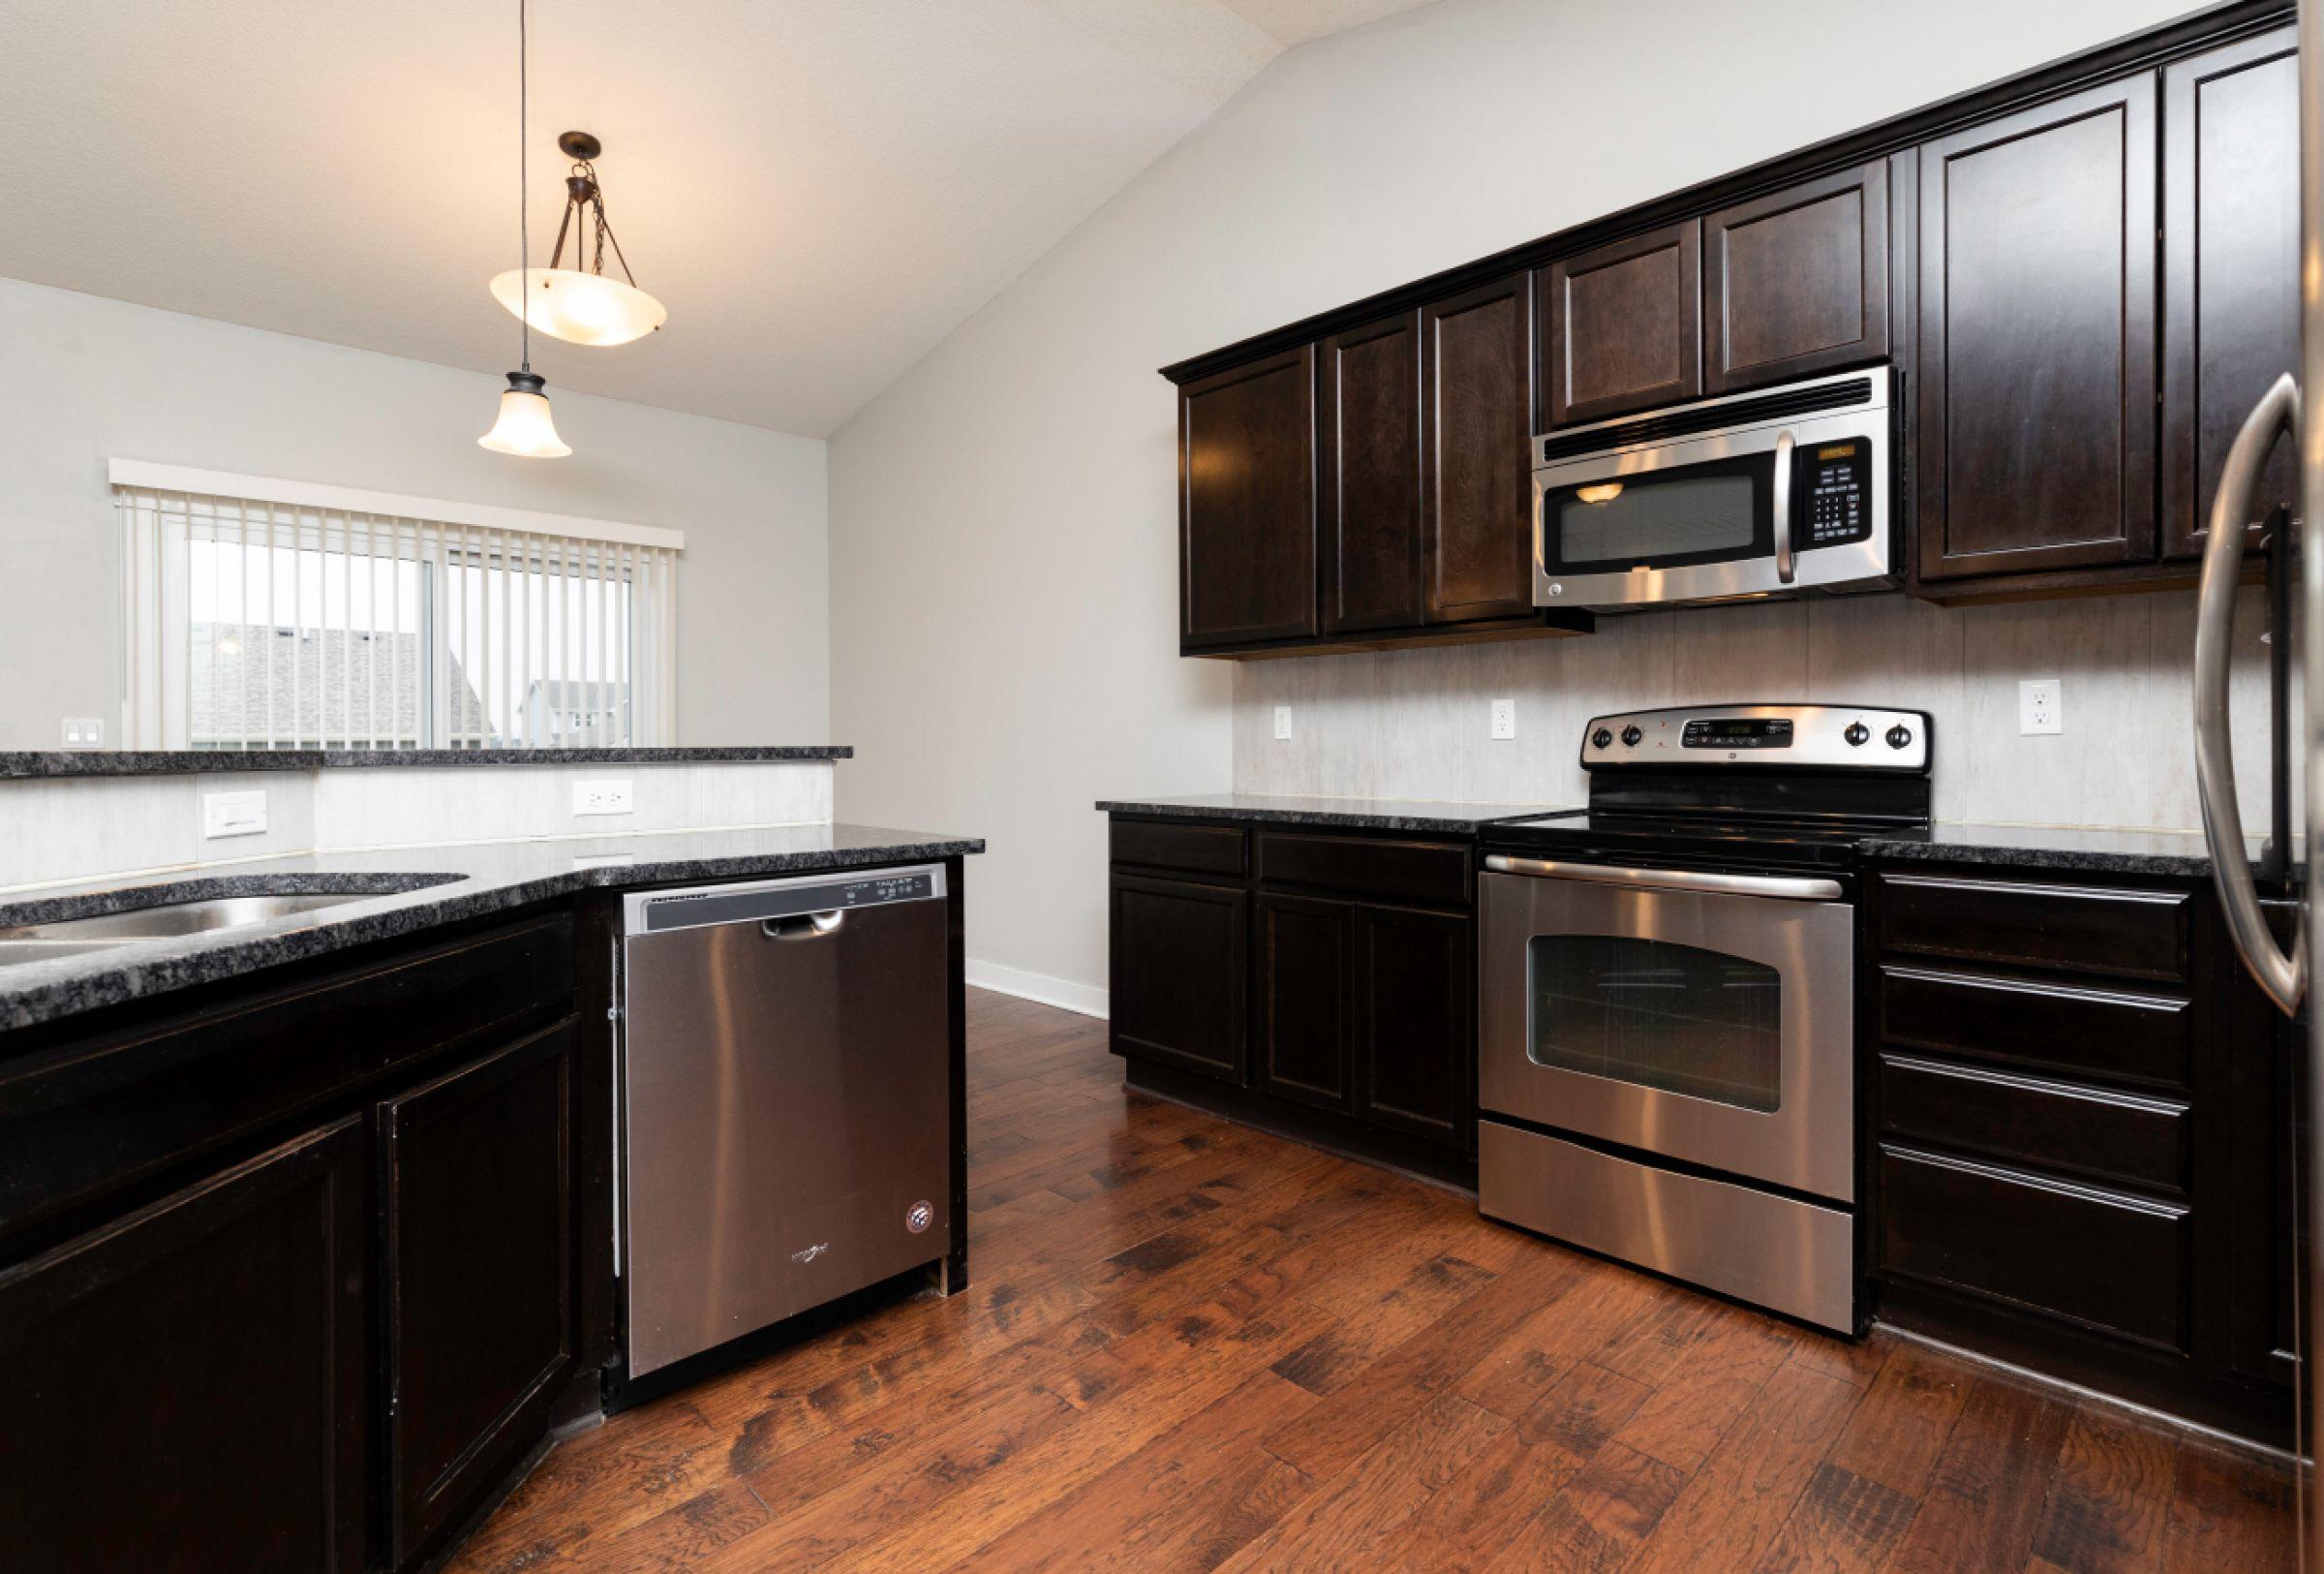 residential-polk-county-iowa-0-acres-listing-number-15273-1-2020-12-07-221721.jpg